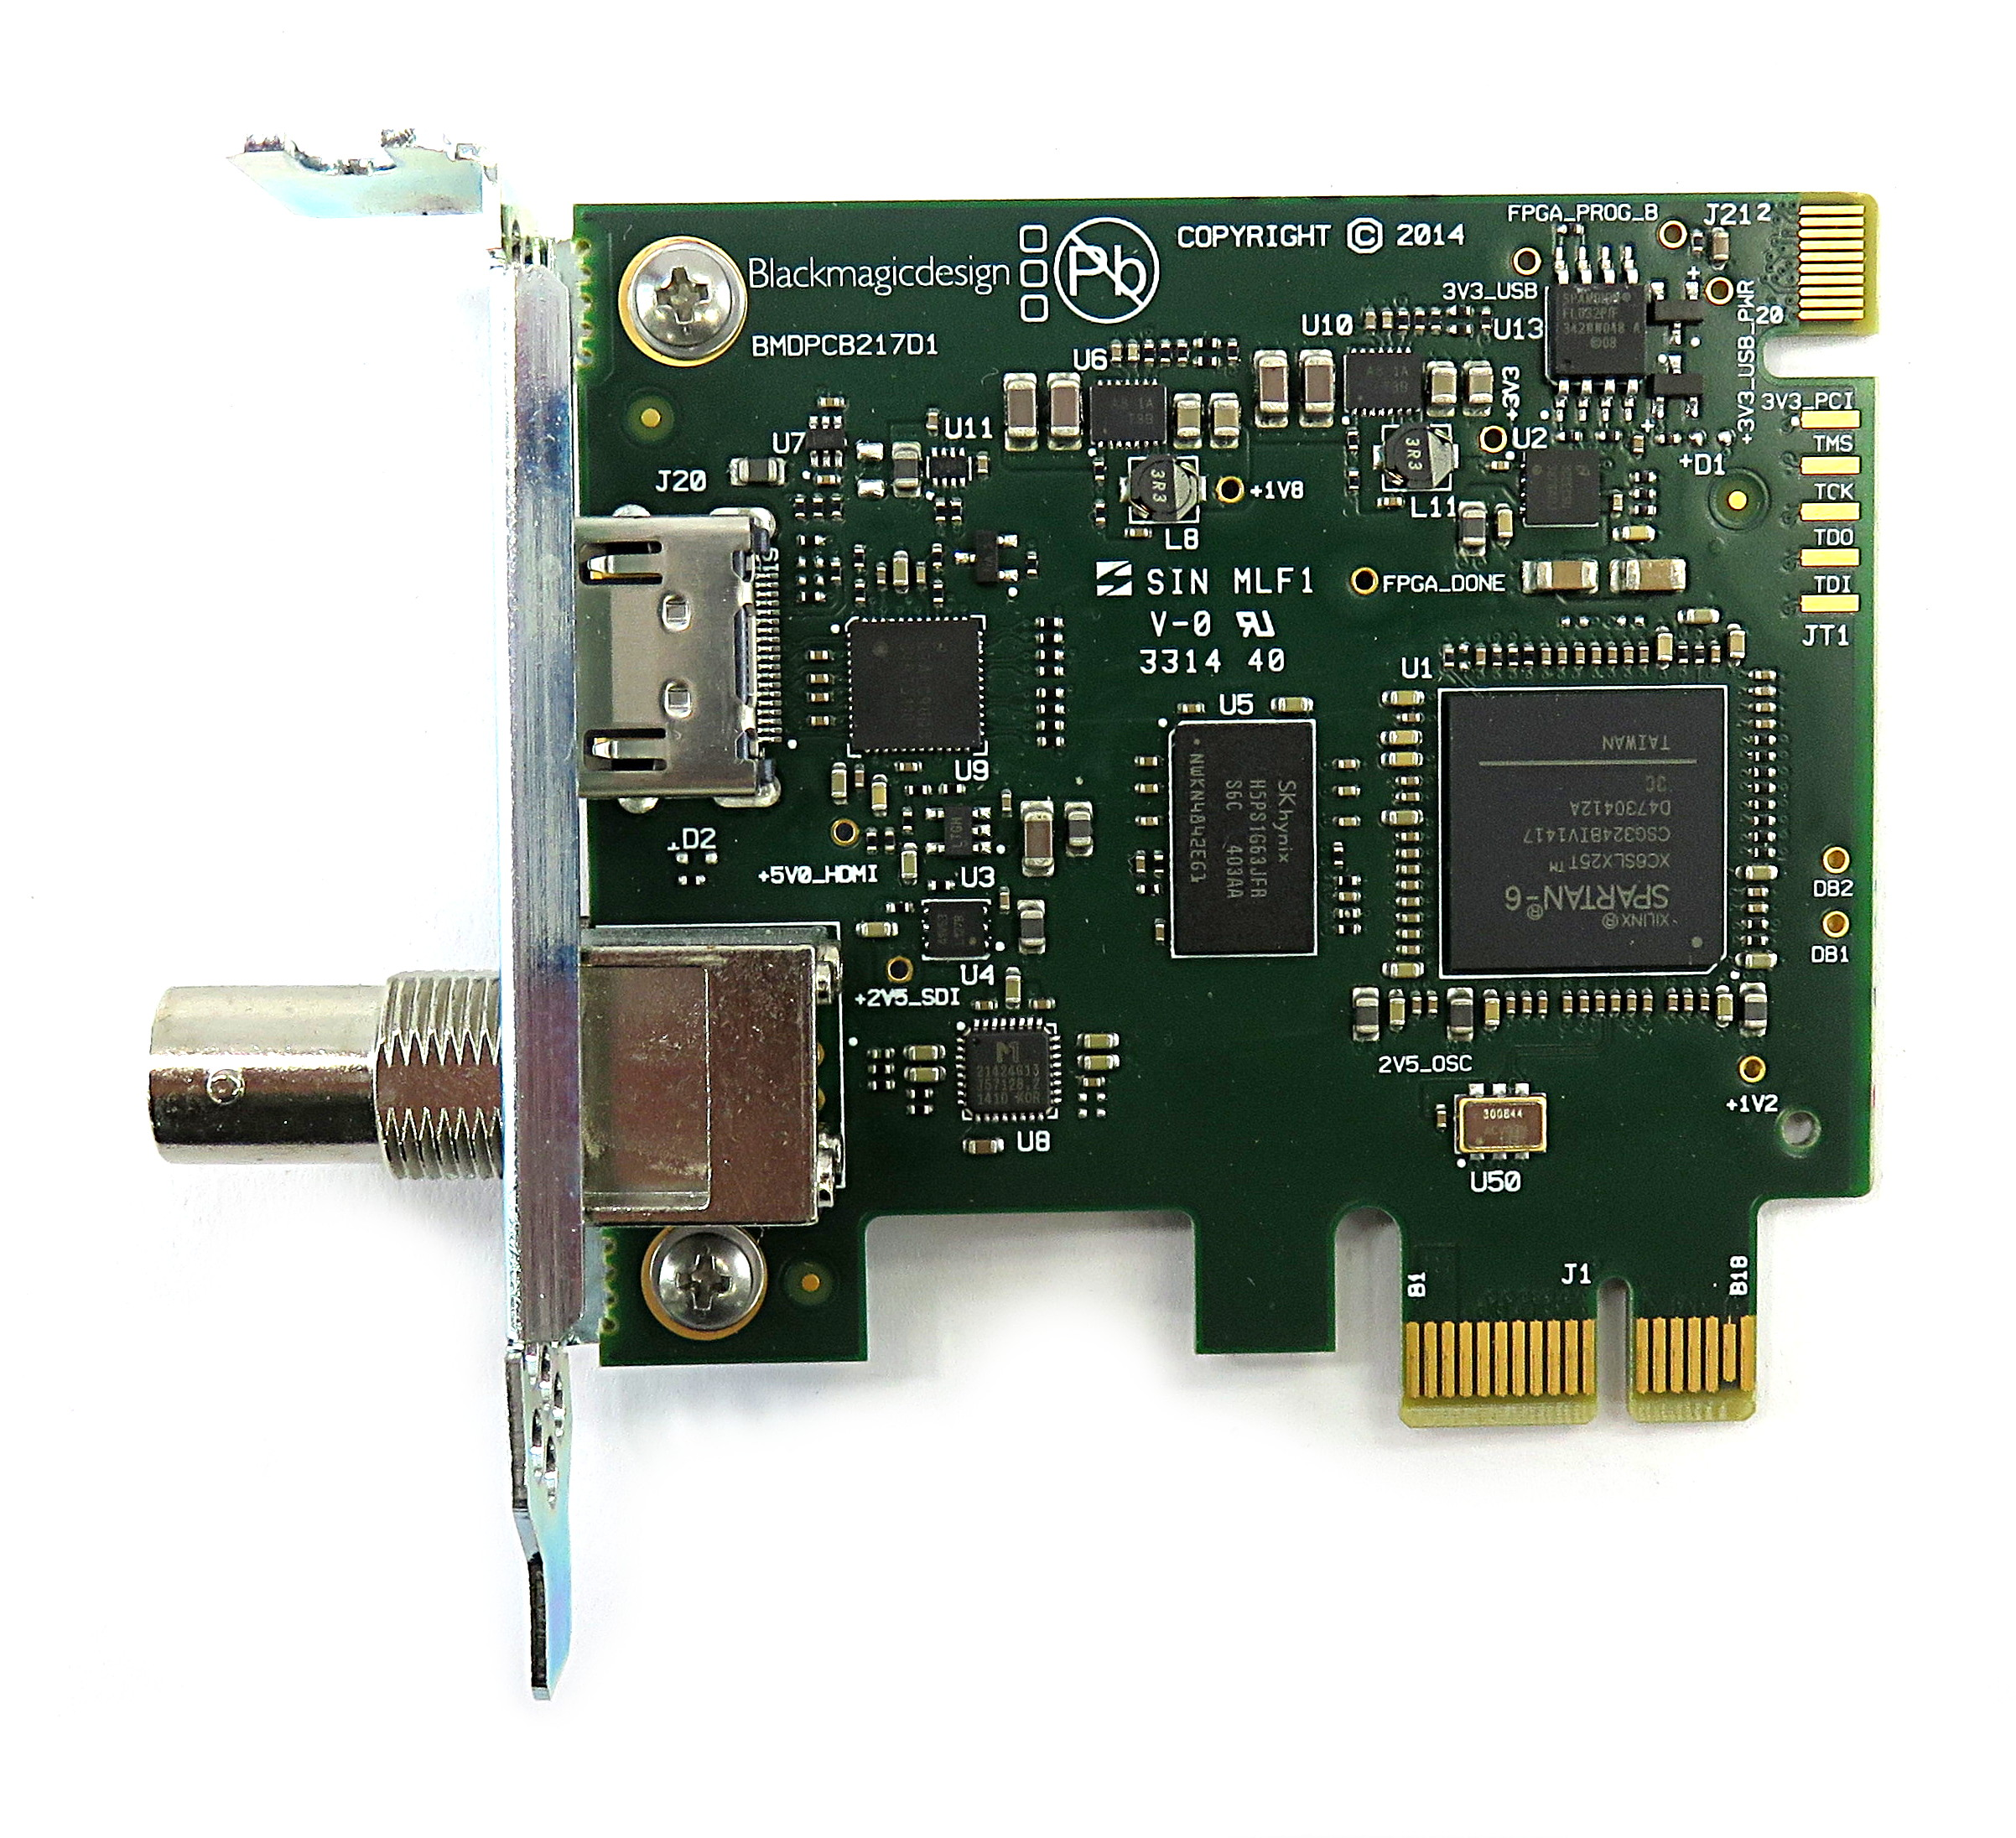 Blackmagic Design Decklink Mini Recorder Pcie Hdmi Sdi Capture Card Other Blackmore It